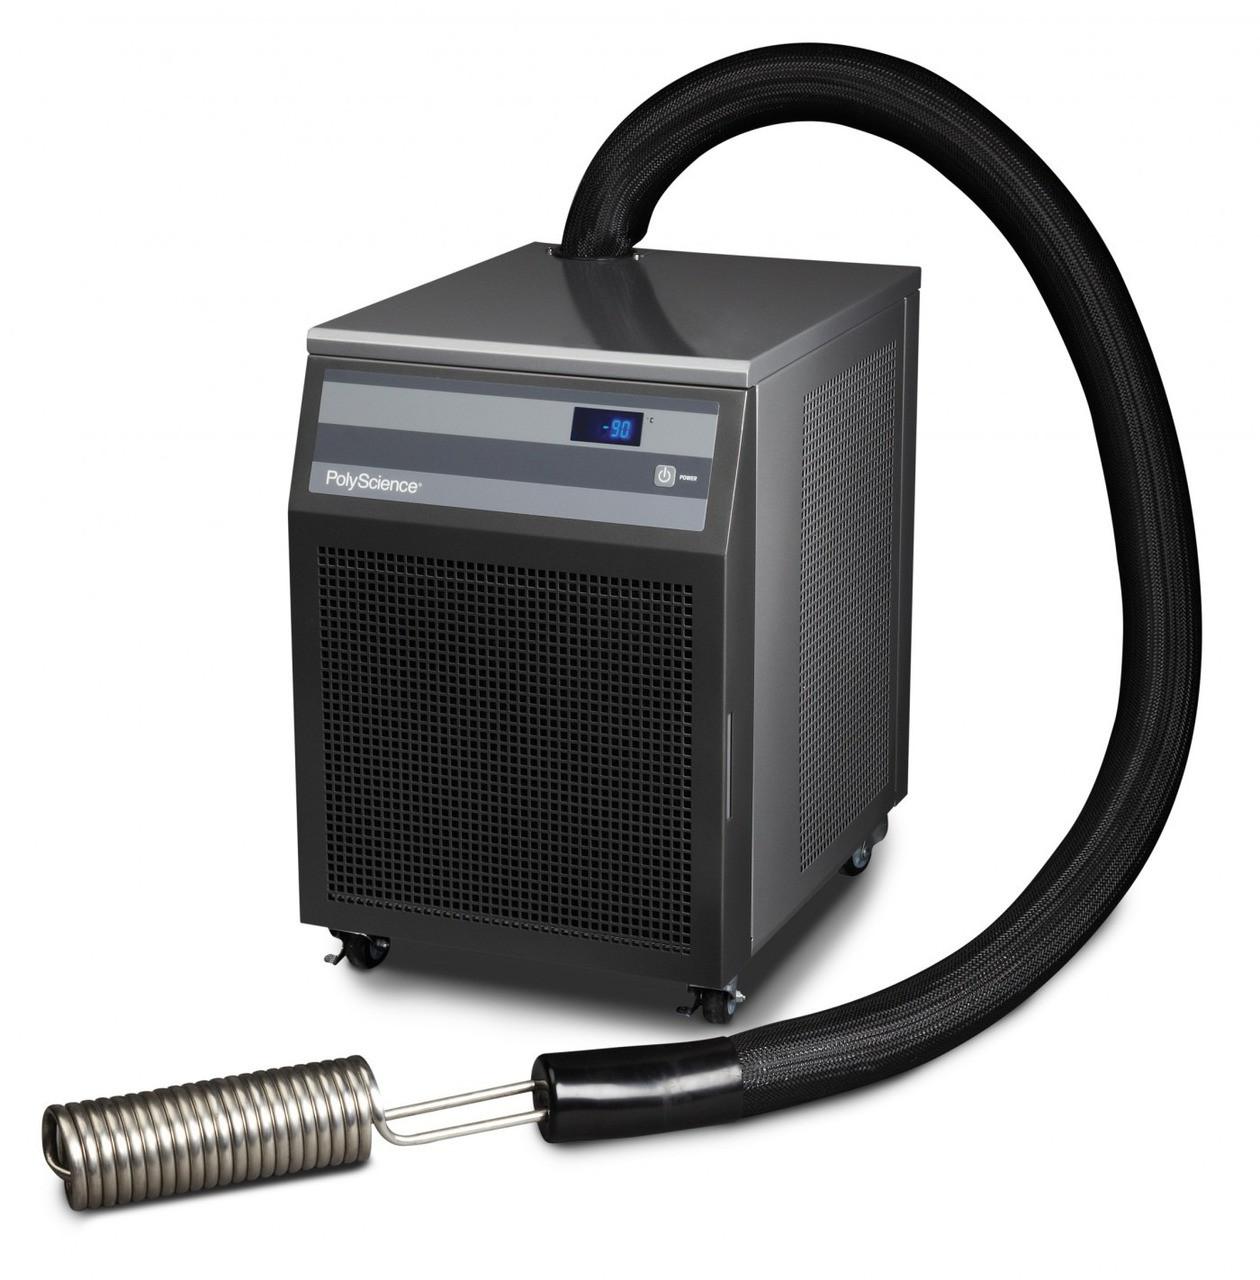 "Polyscience IP-100 Low Temperature Cooler, 3"" Rigid Coil Probe"